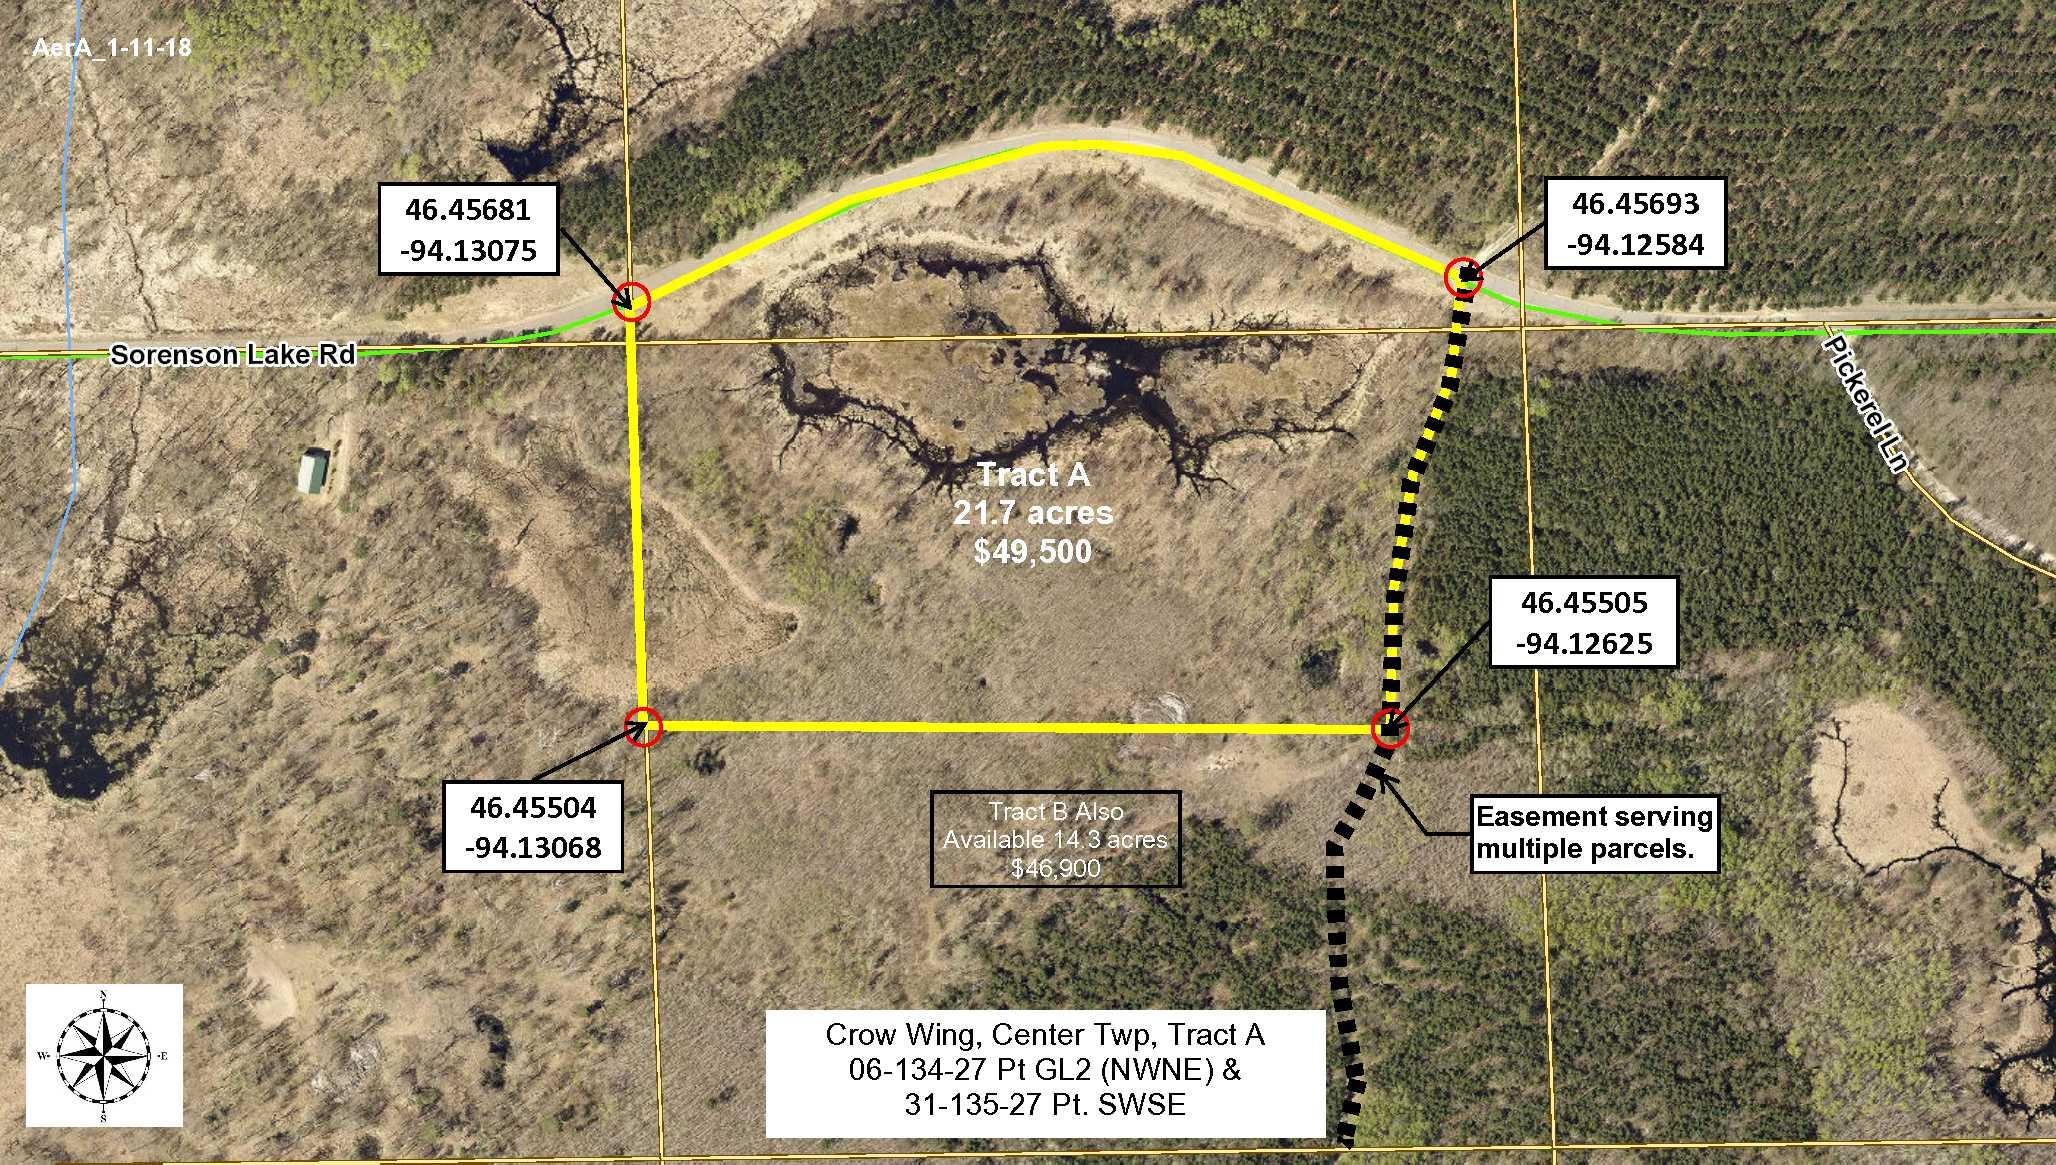 Tract A, 06-134-27, Pt GL2(NWNE) & 31-135-27, Pt SWSE, Sorenson Lk Rd, Merrifield